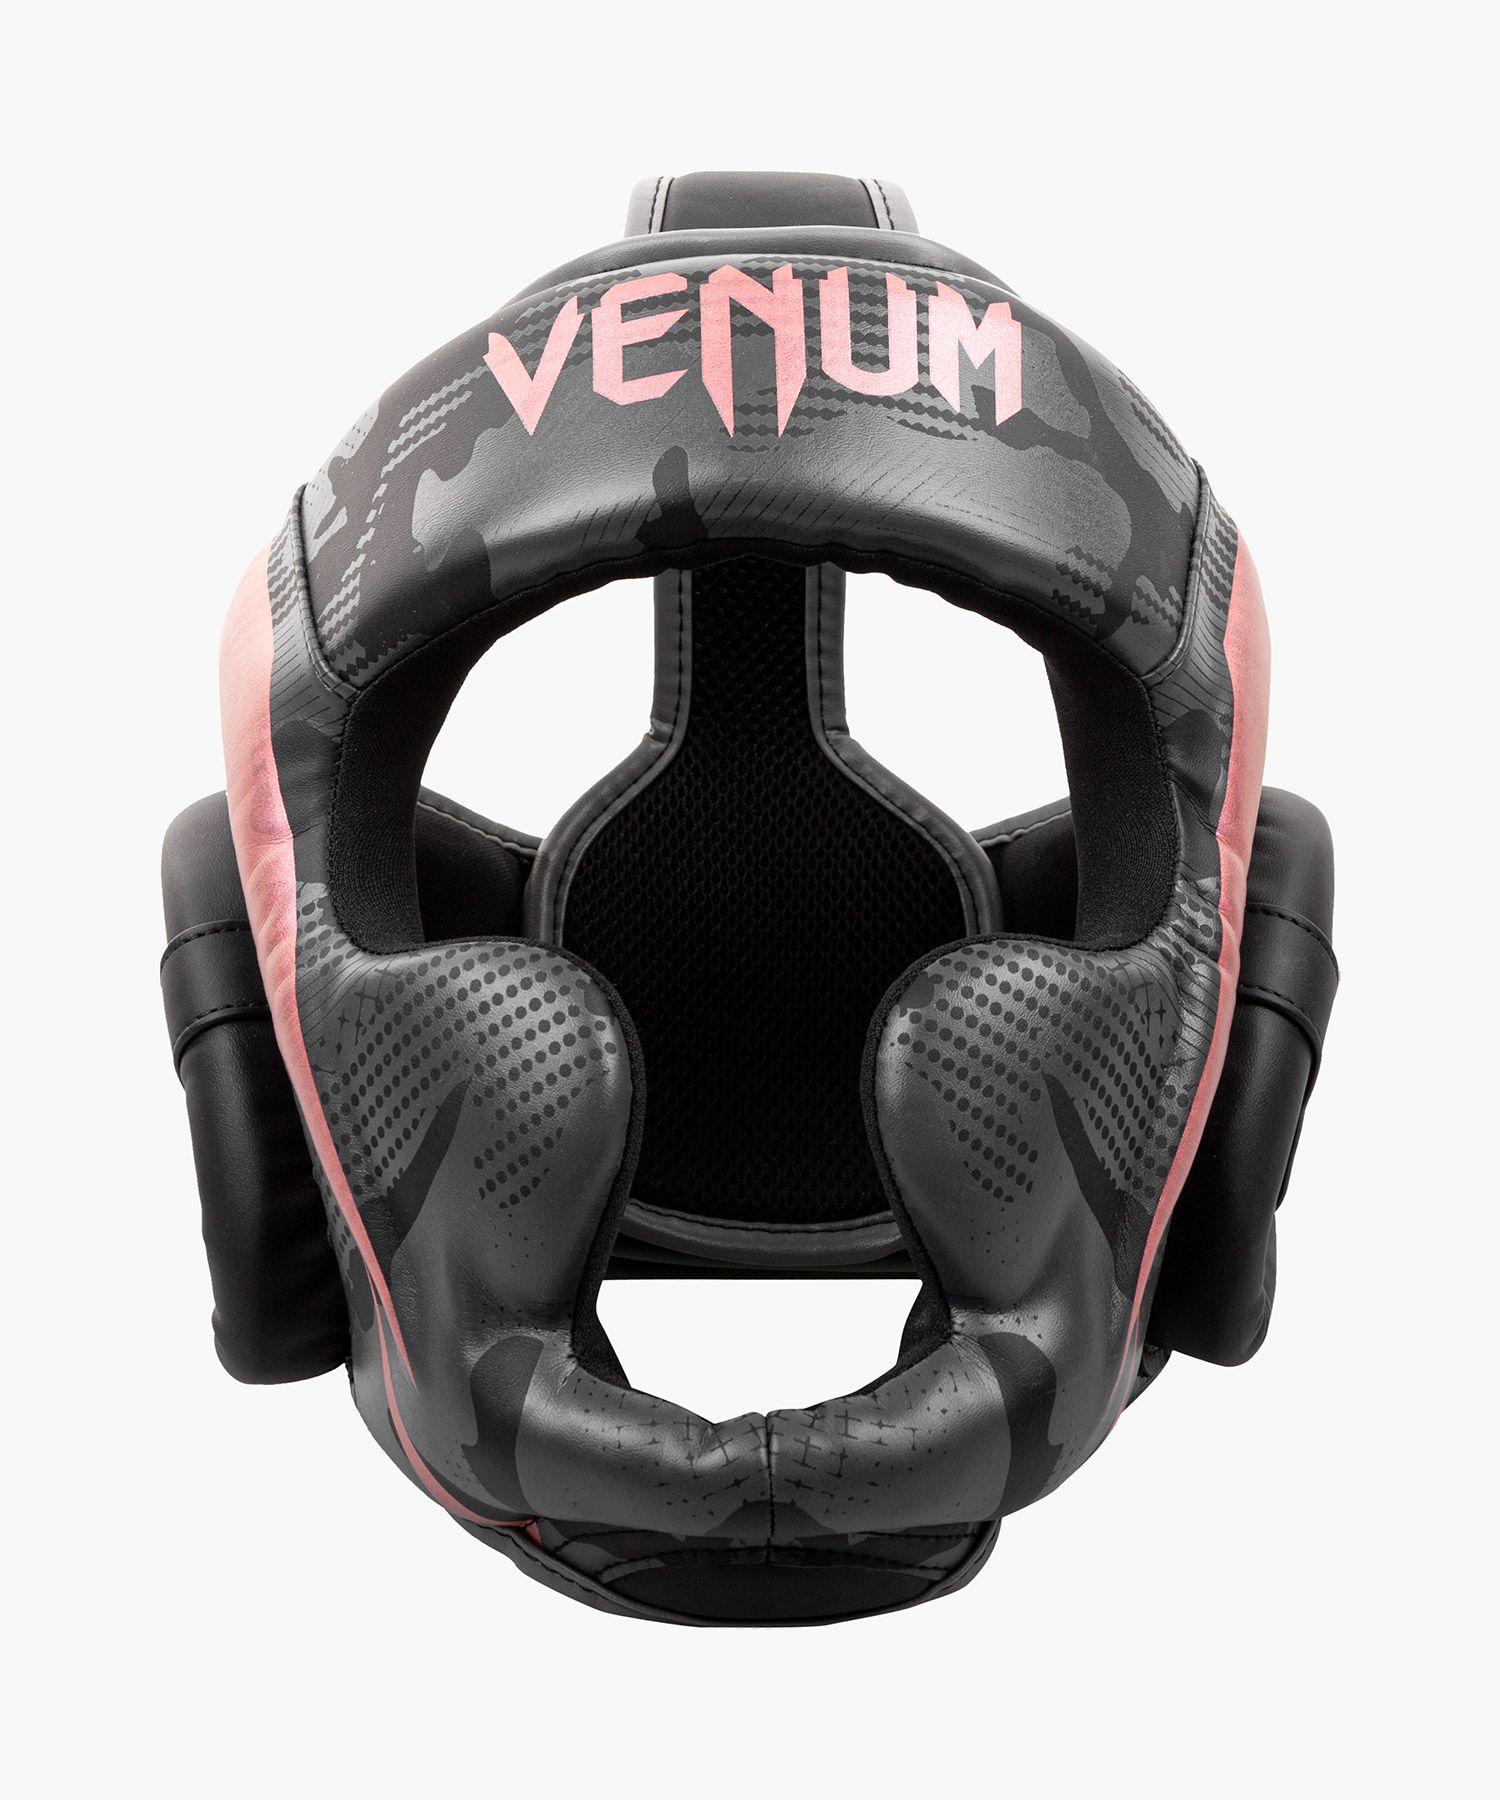 Venum Elite Bokshelm - Zwart/Rozegoud